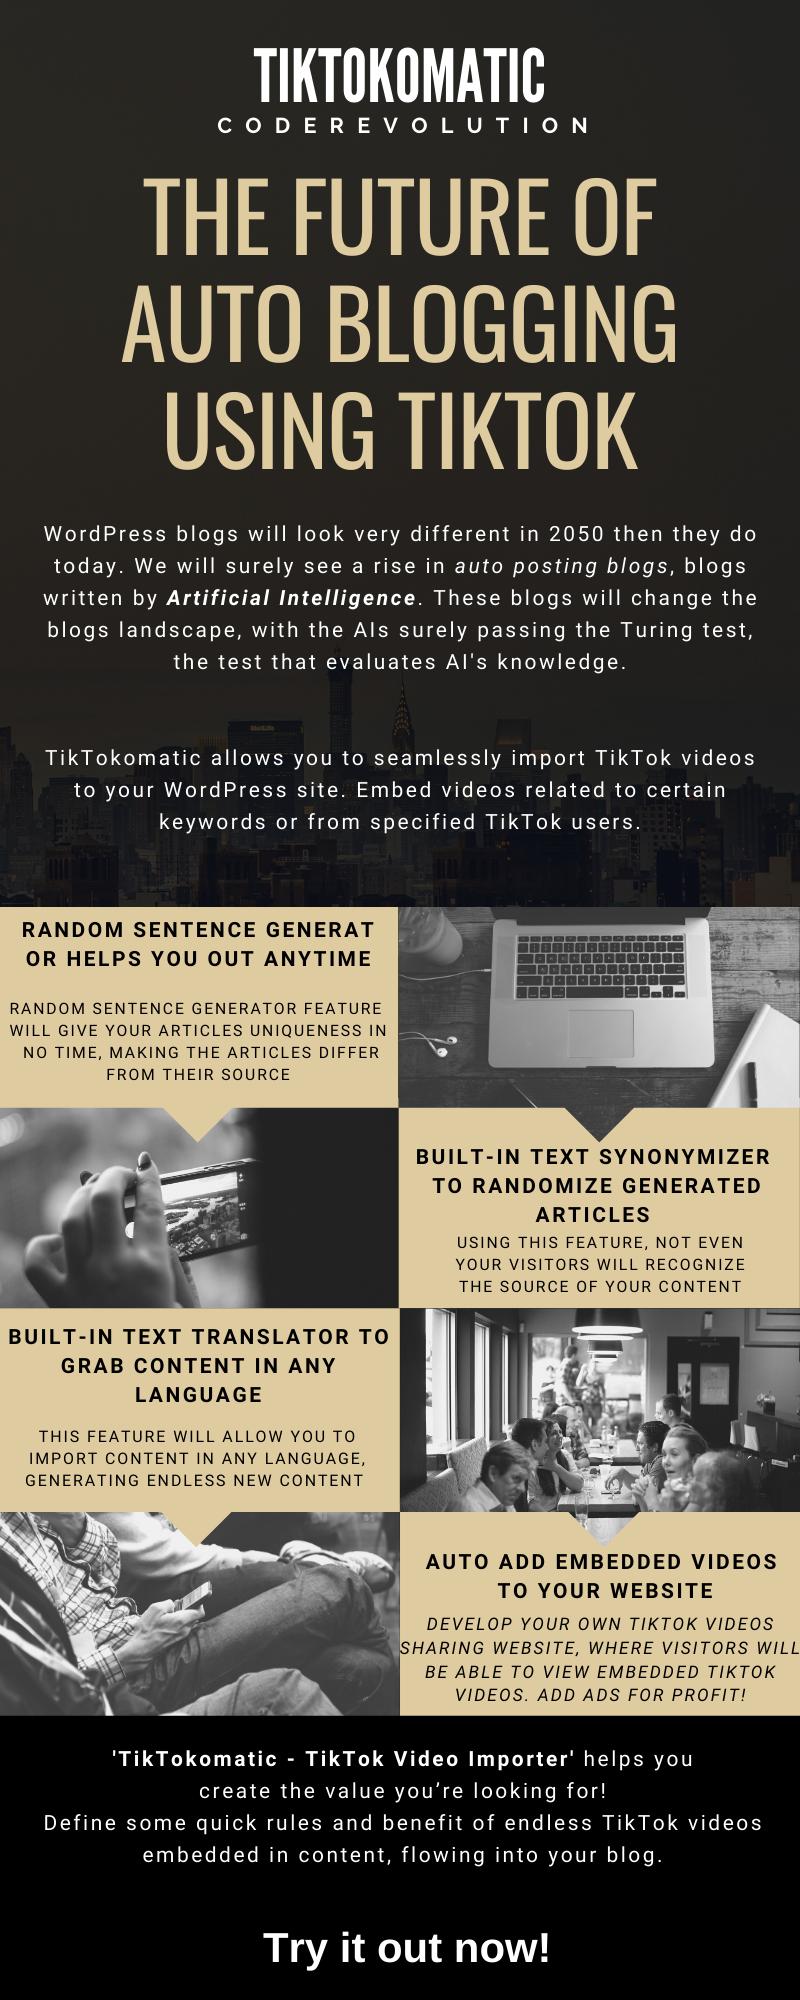 TikTokomatic Video Importer